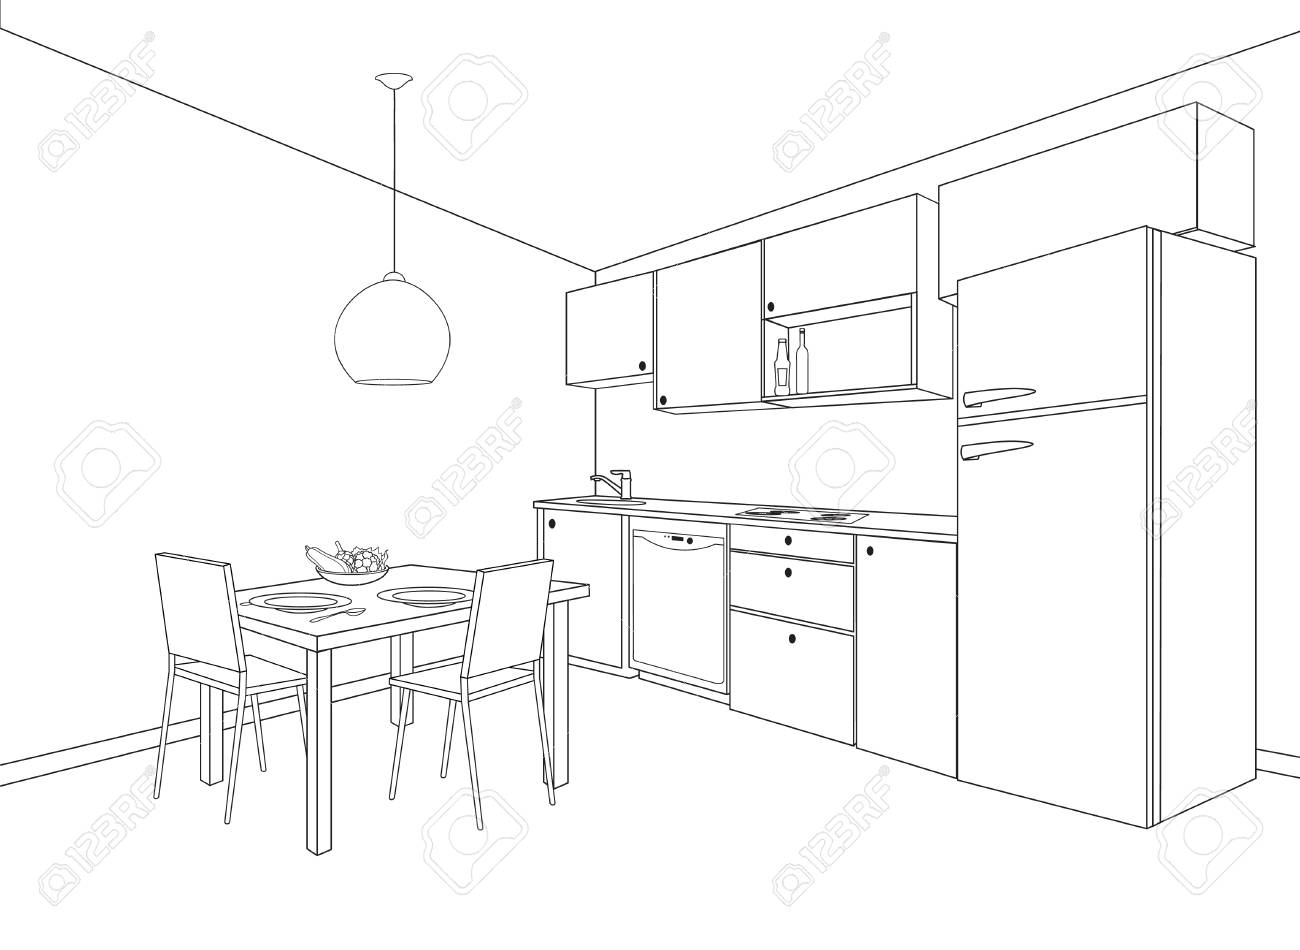 Kitchen Design 3d Drawing